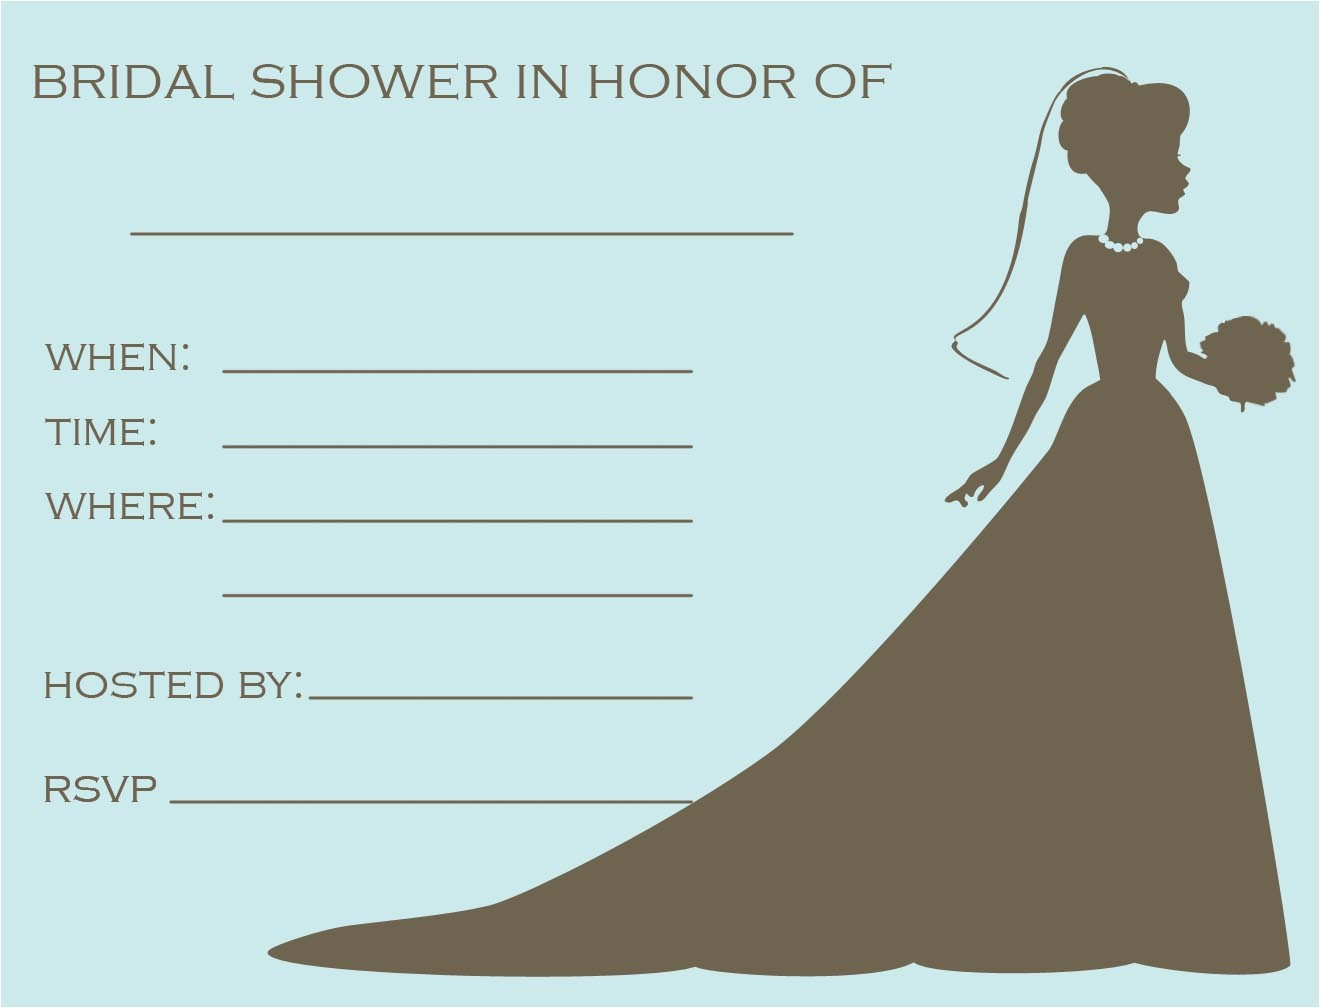 Free Bridal Shower Invitation Templates to Print 12 Mesmerizing Free Bridal Shower Flyer Templates Demplates